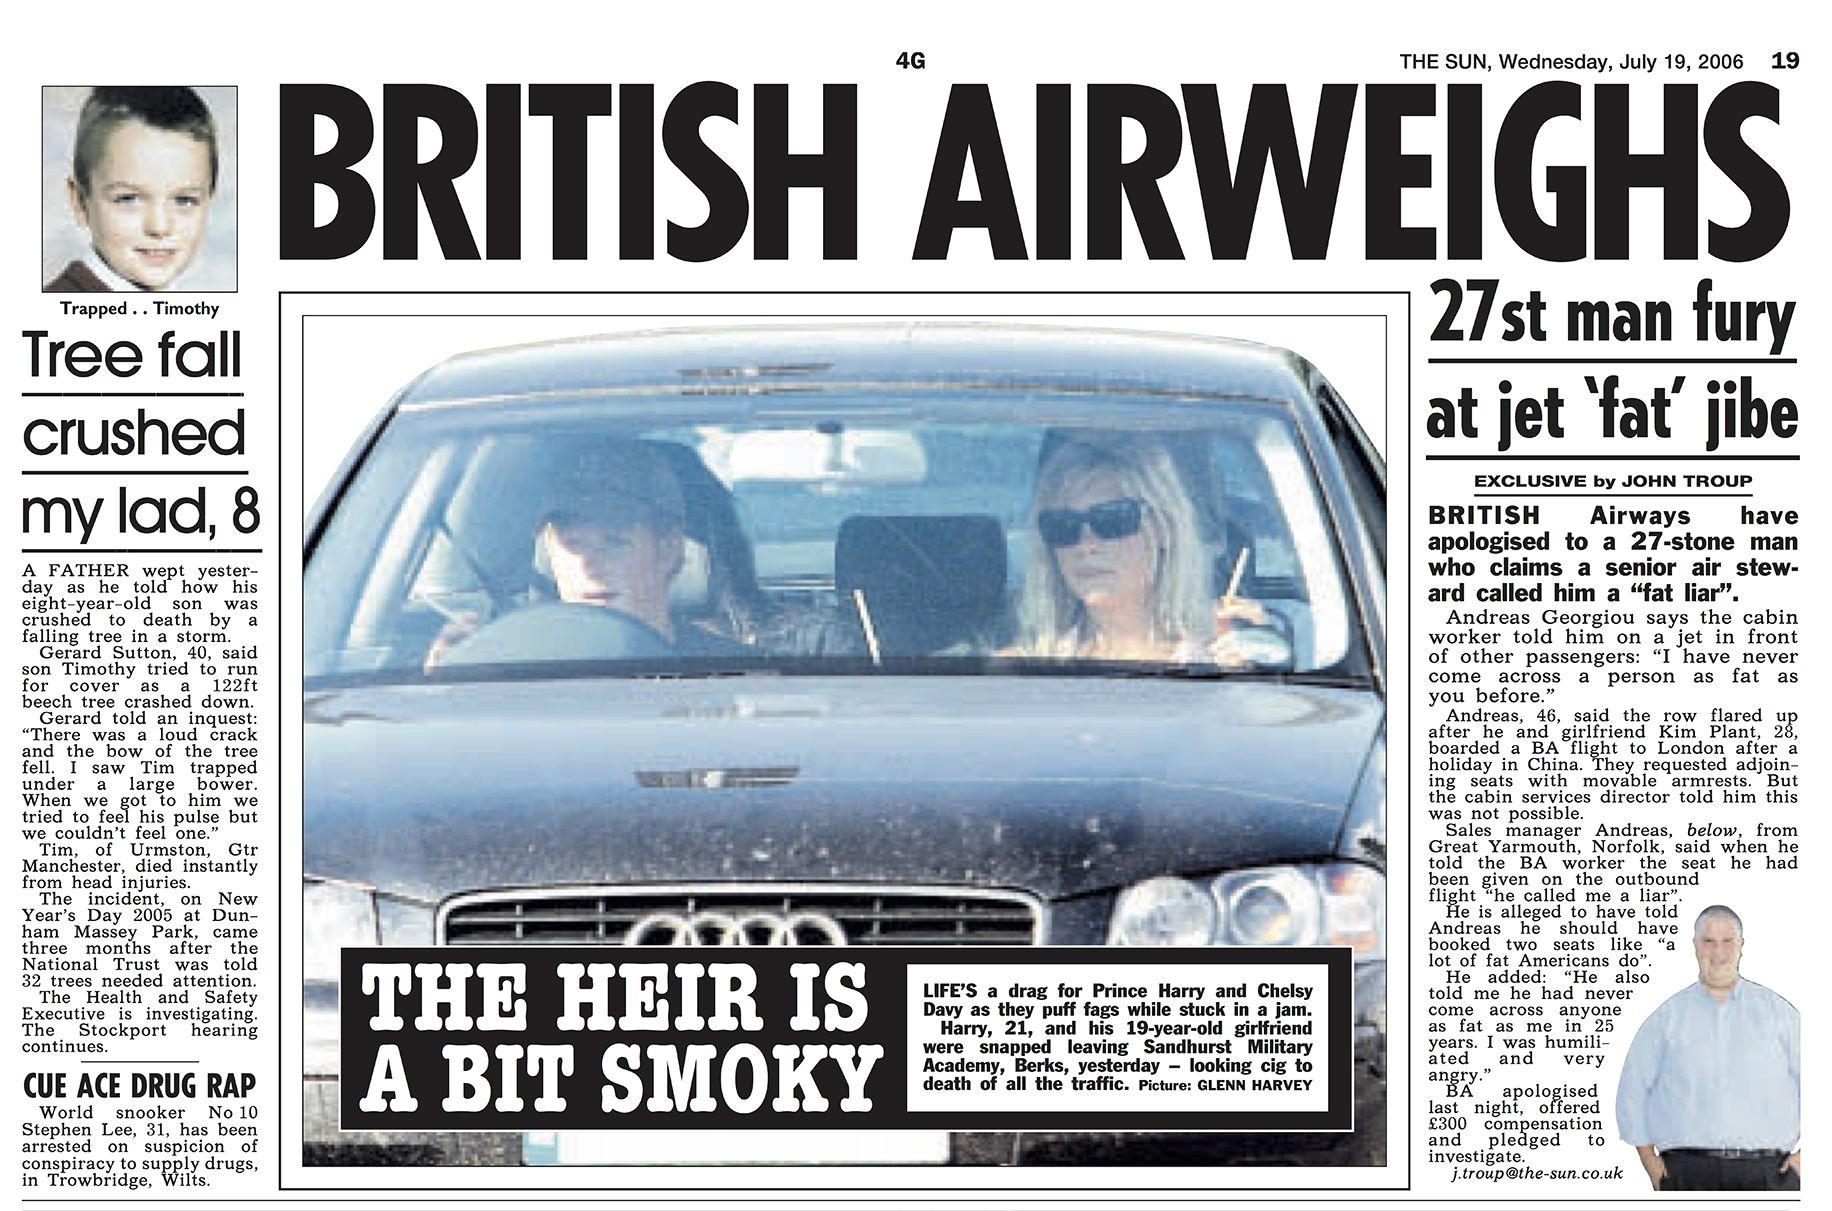 HRH Prince Harry and girlfriend Chelsy Davy smoking